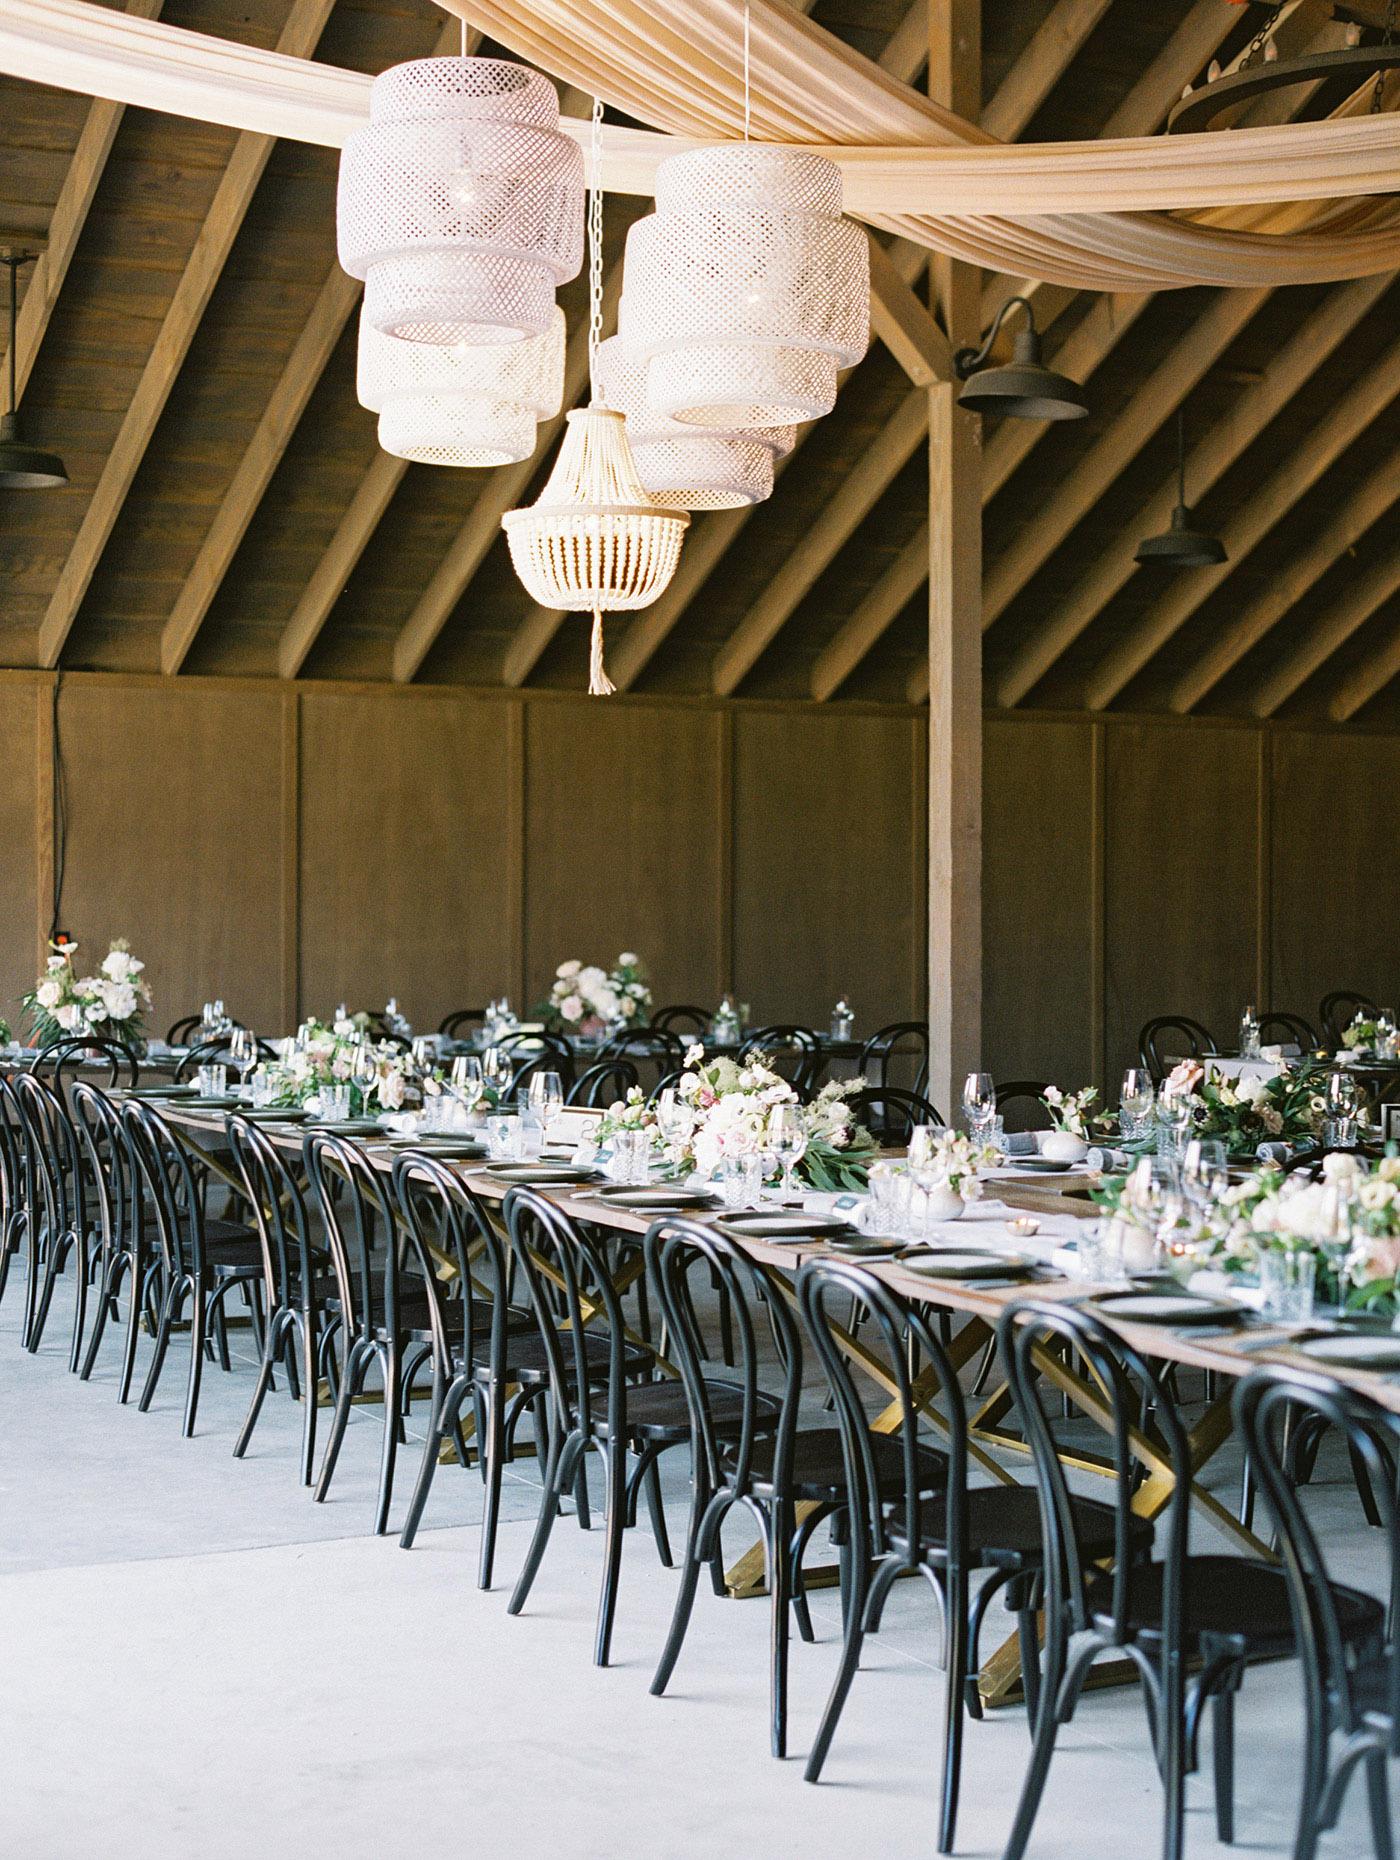 Caitlin and Fletcher wedding reception tables